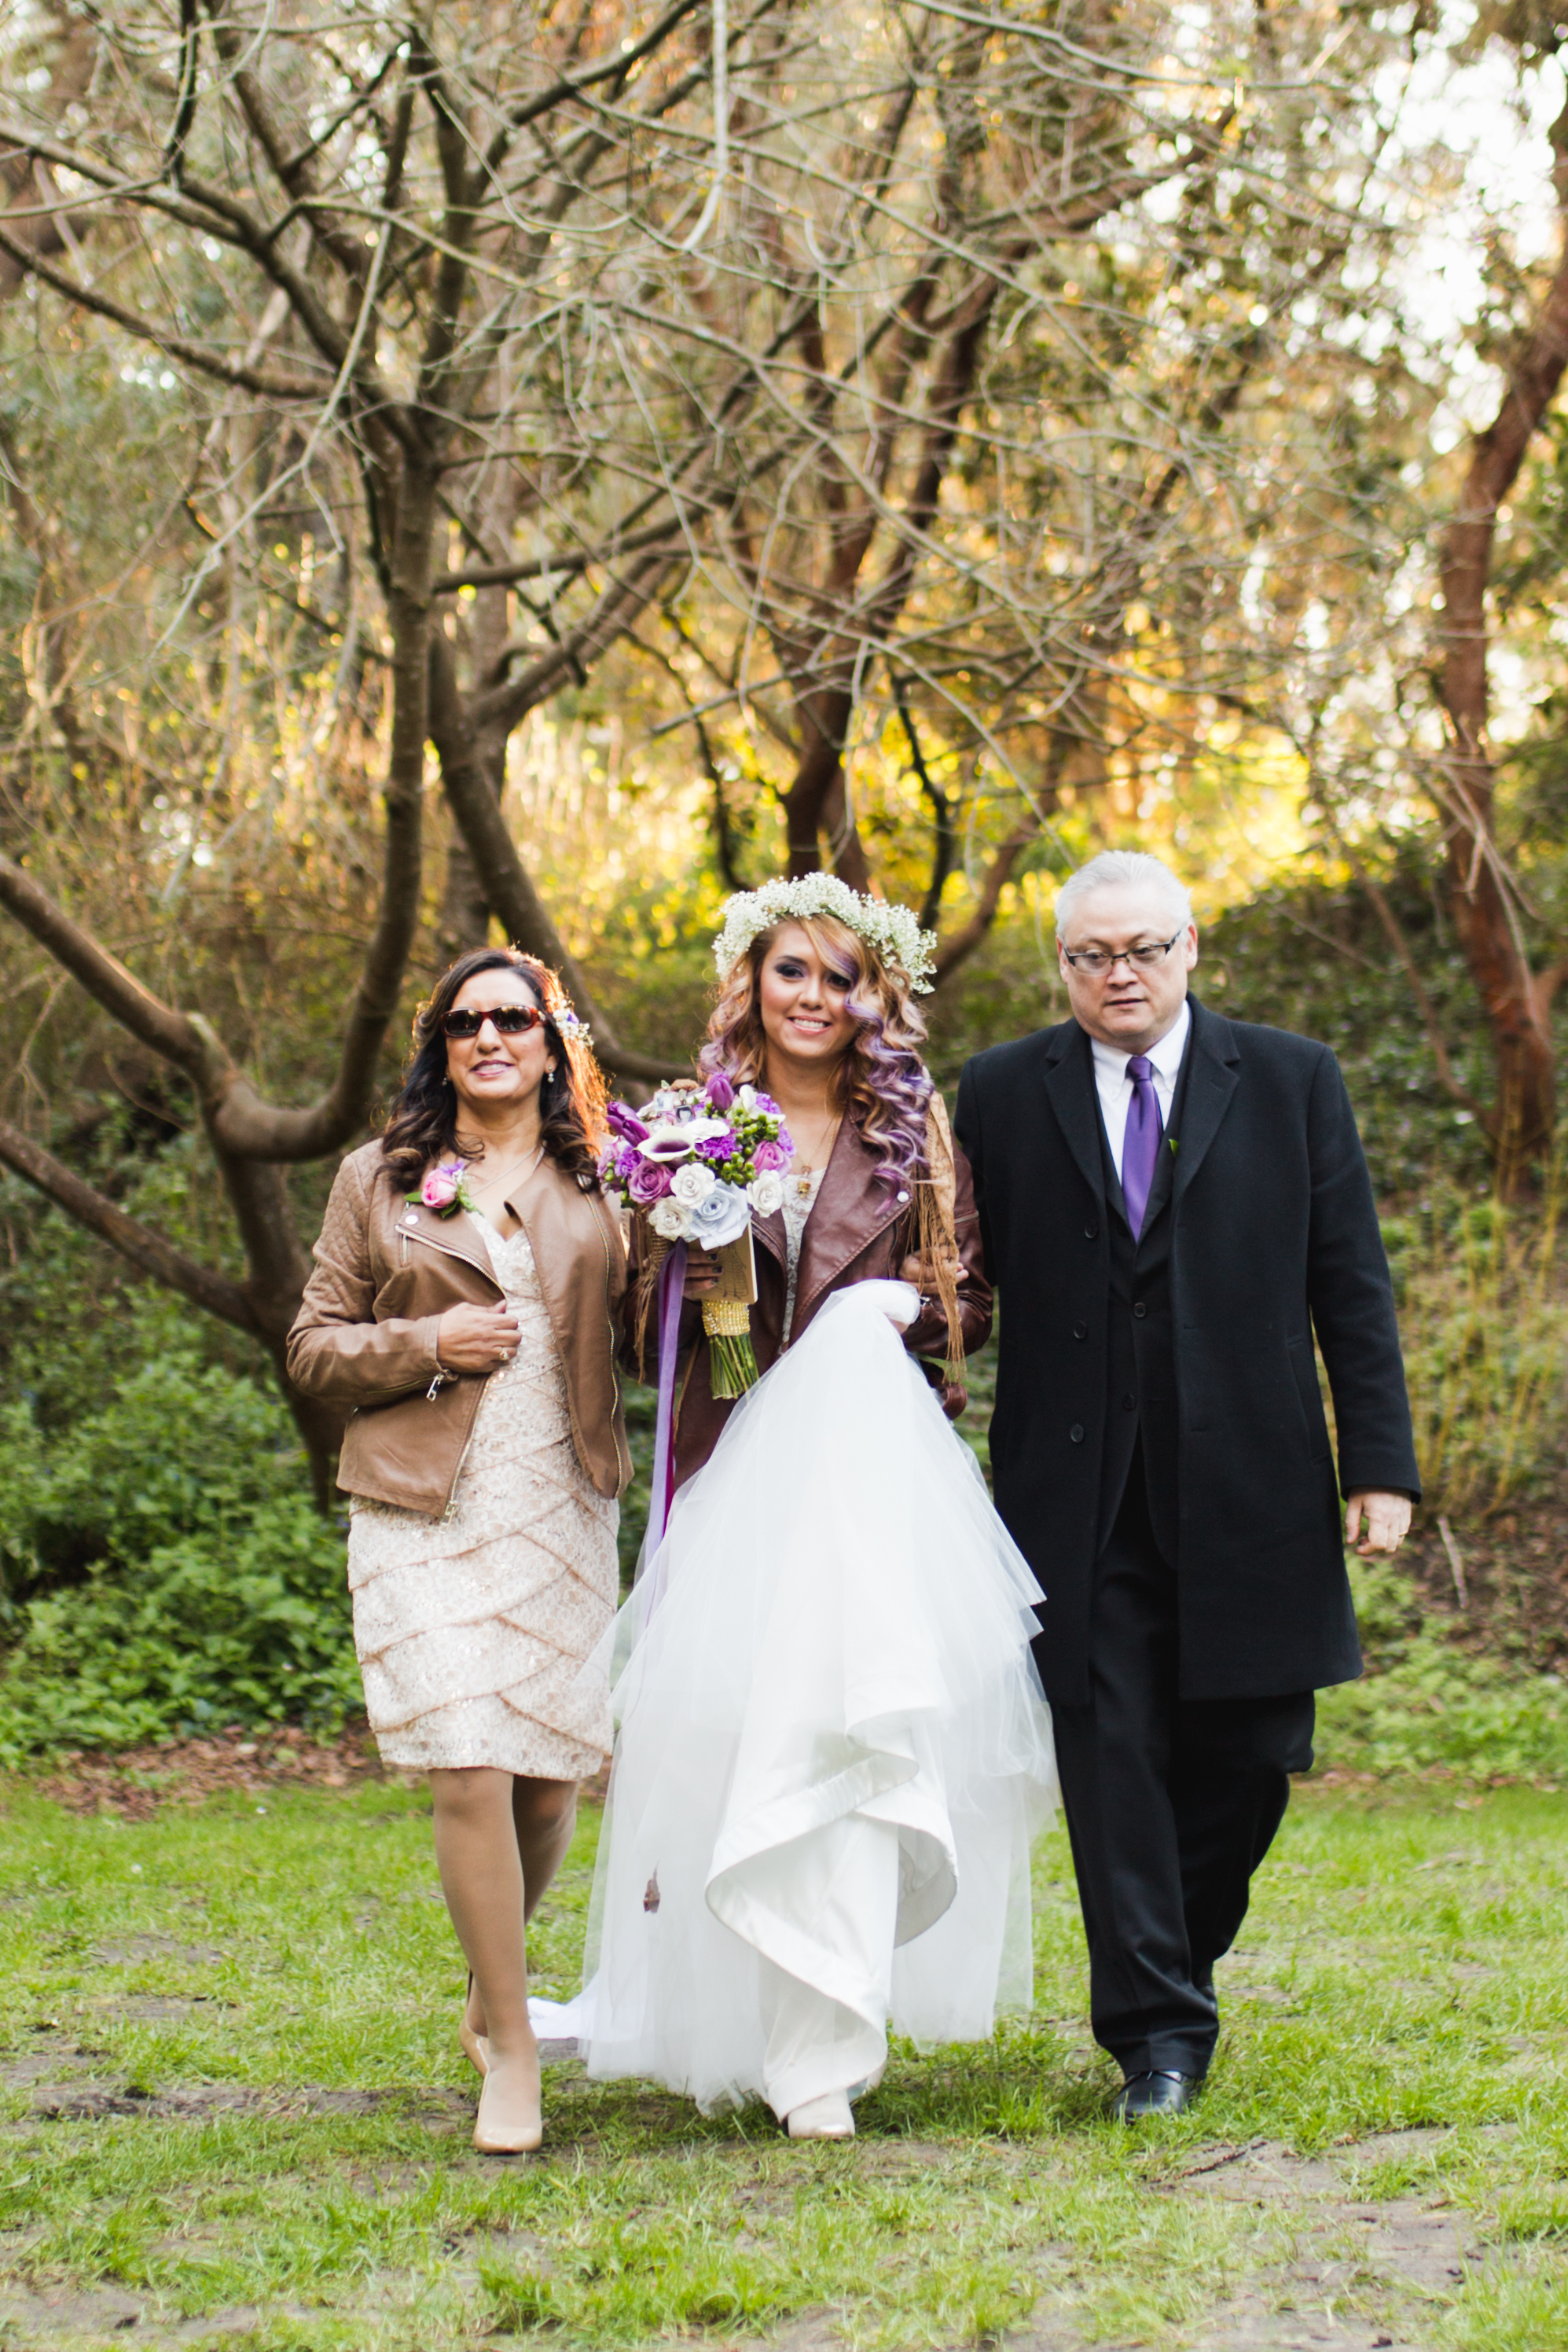 golden-gate-park-wedding-ceremony-flower-aisle